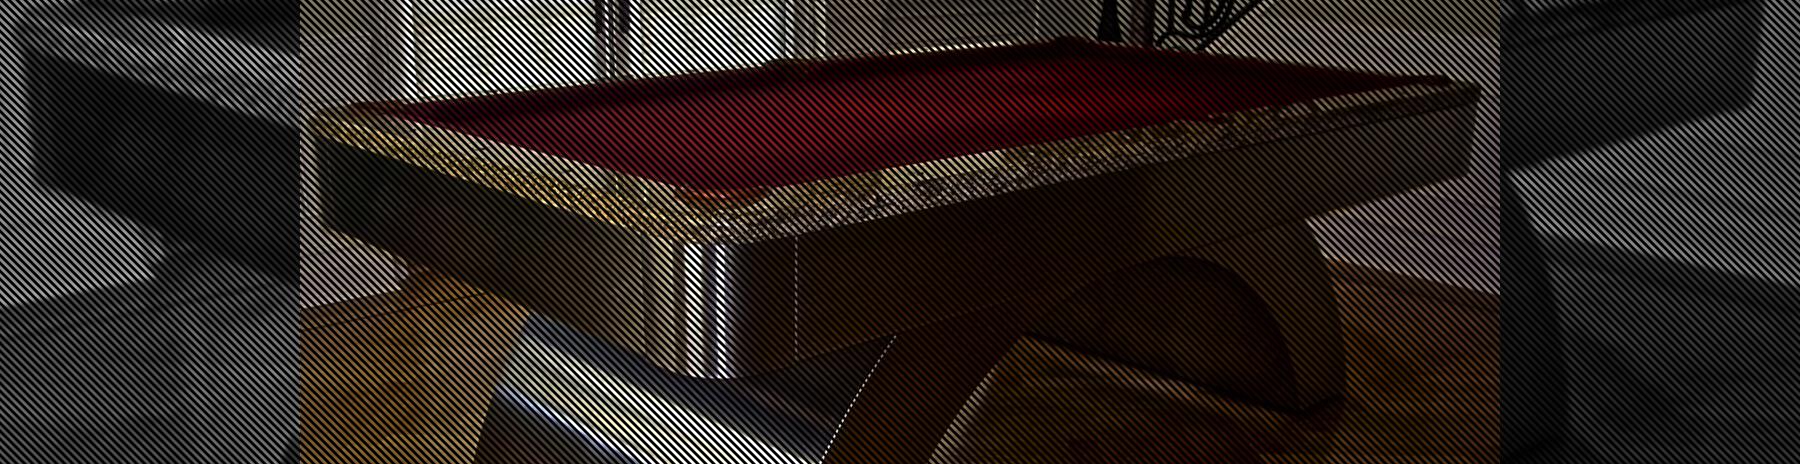 metal billiards table